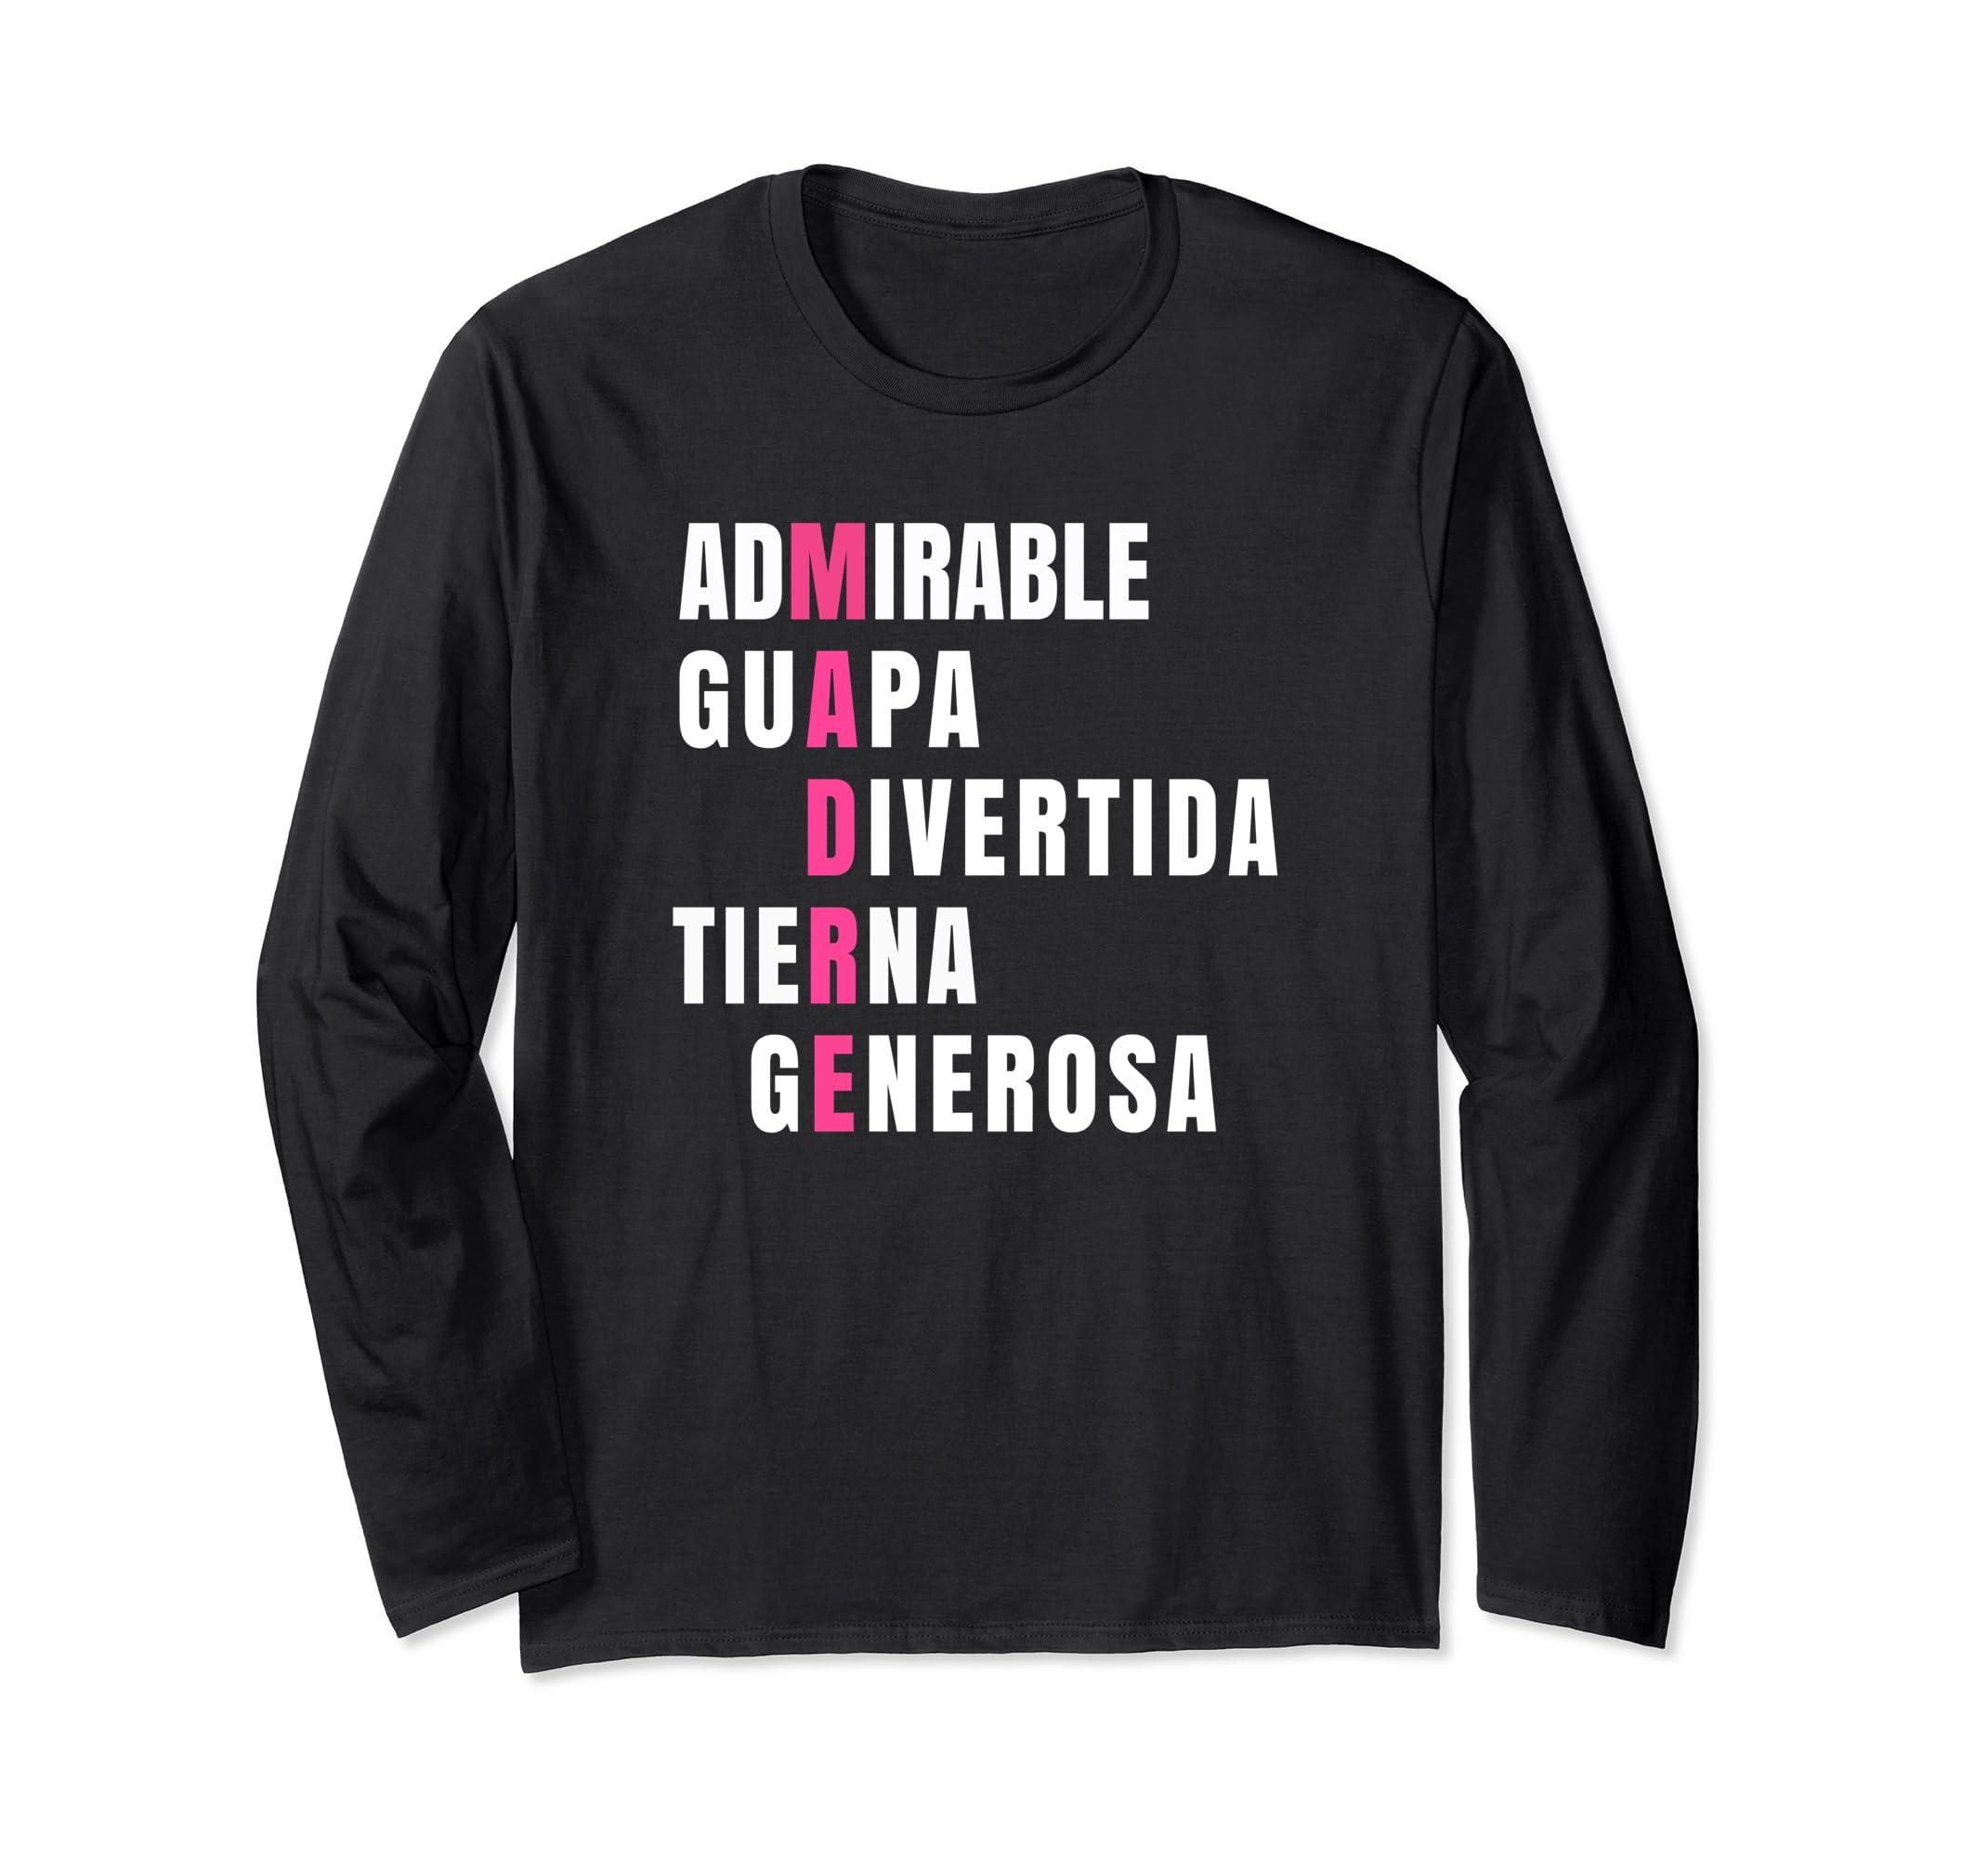 Amazon.com: Camisetas manga larga para Mujer Madres Navidad Cumpleanos: Clothing